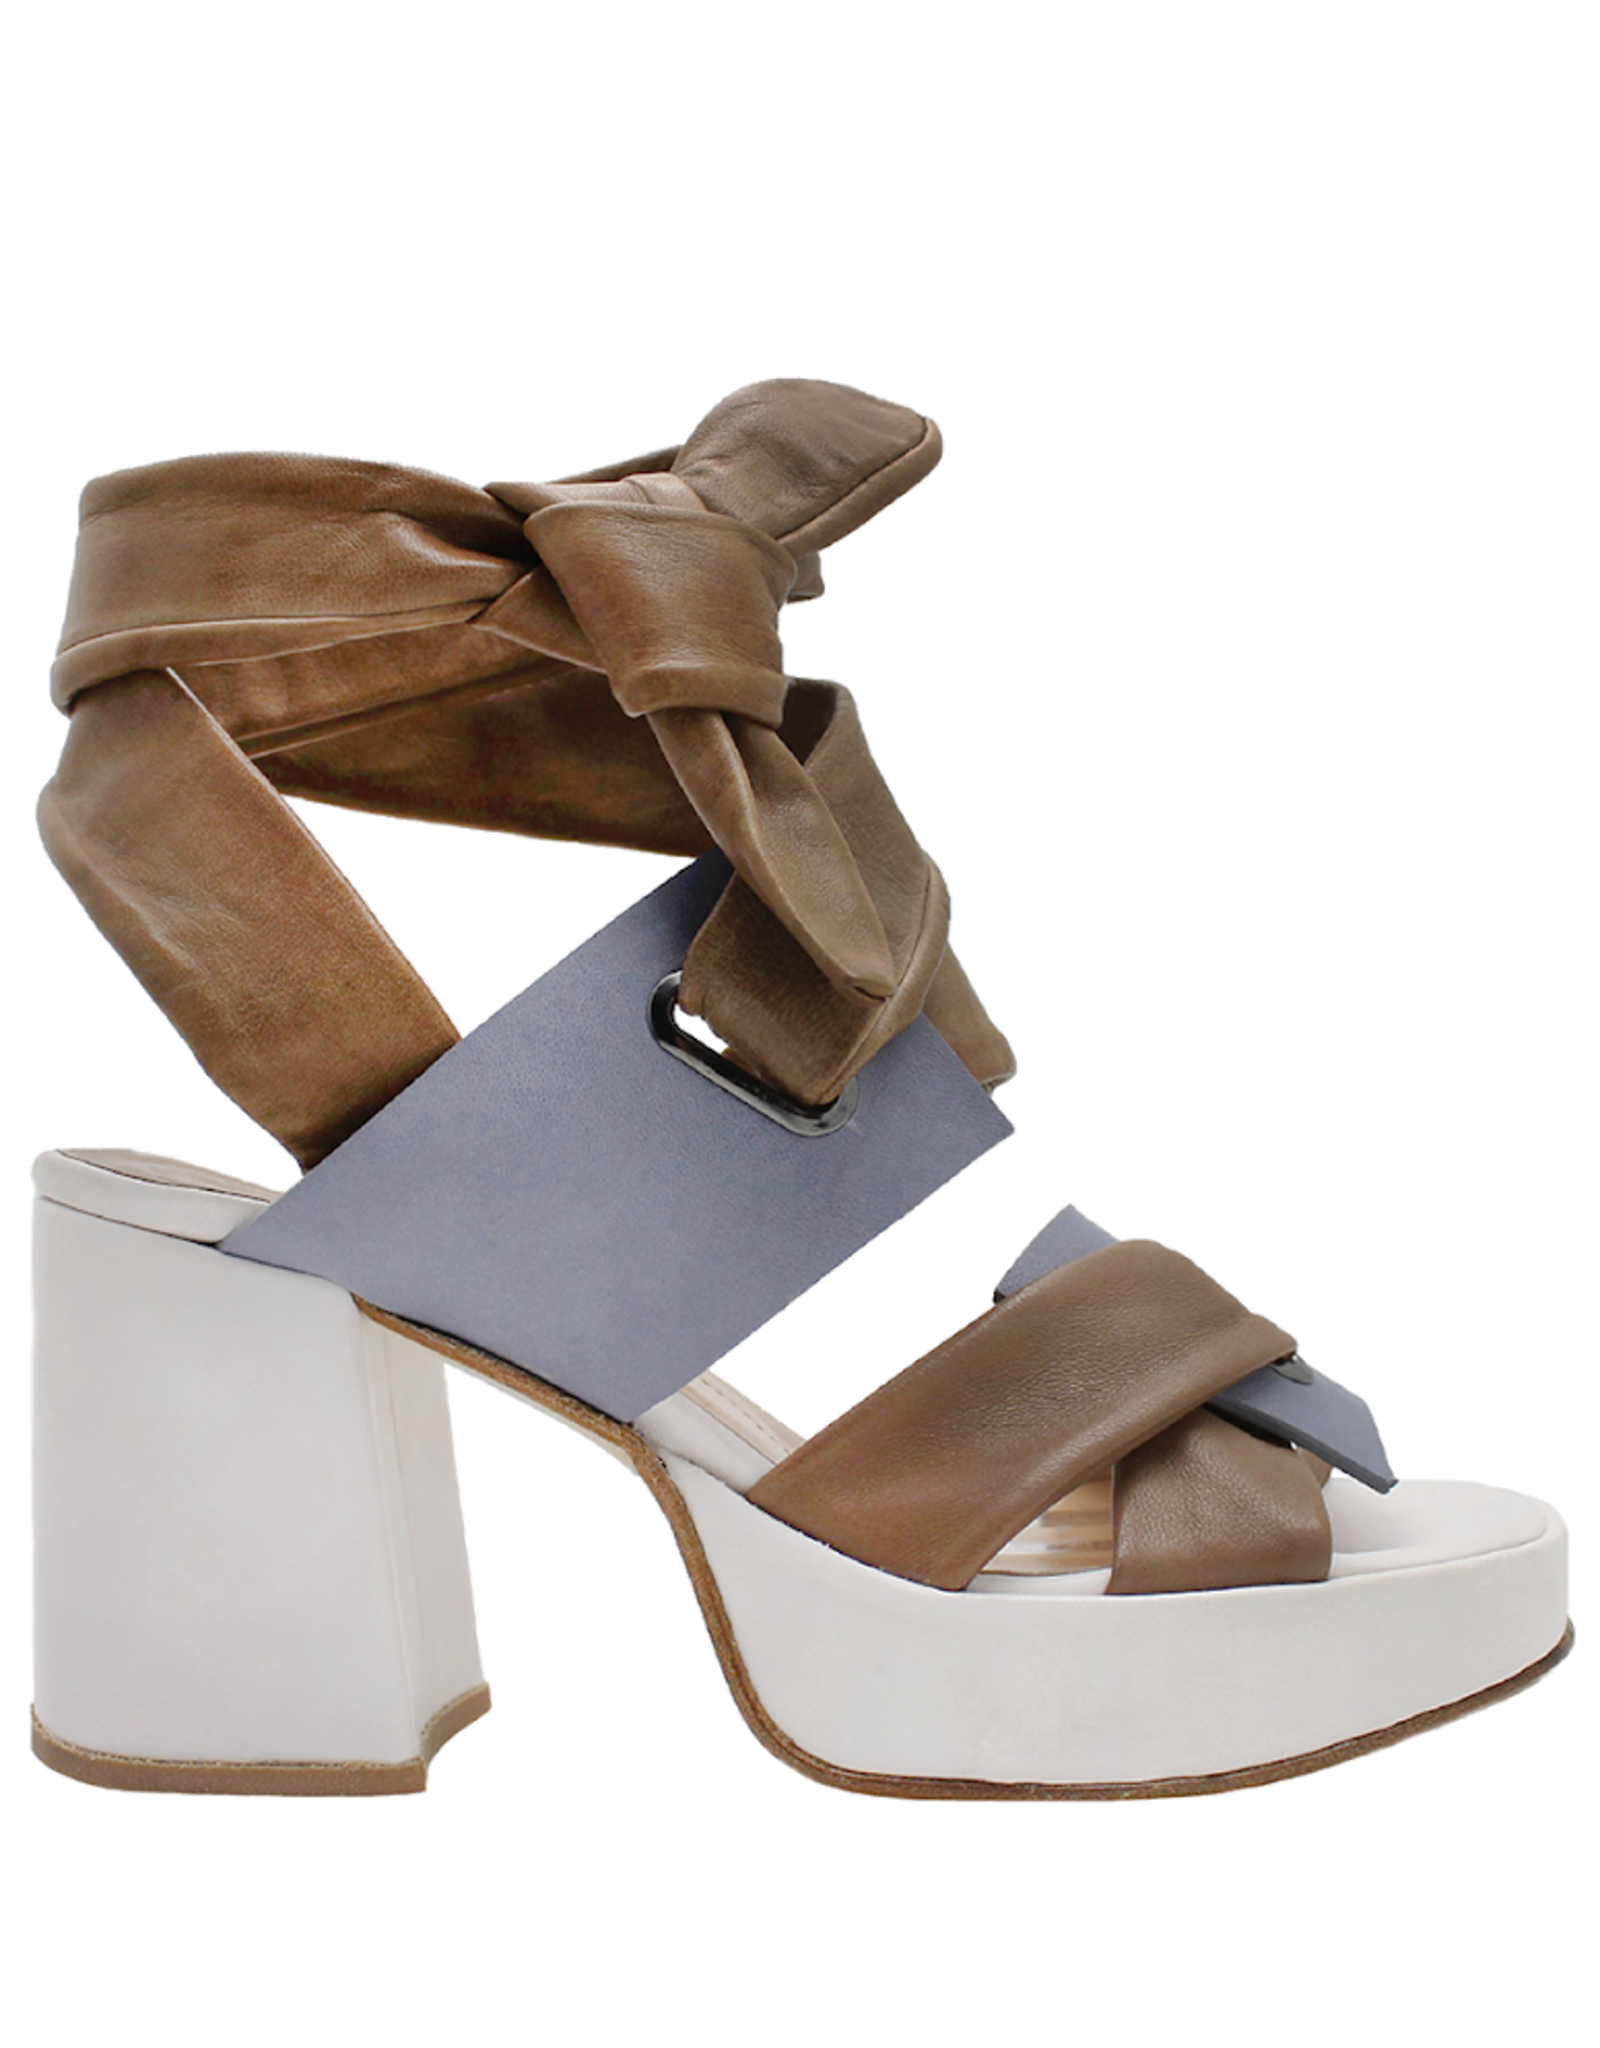 Ixos Ixos Camel/ Wisteria /White Platform Ankle Tie Sandal 9002